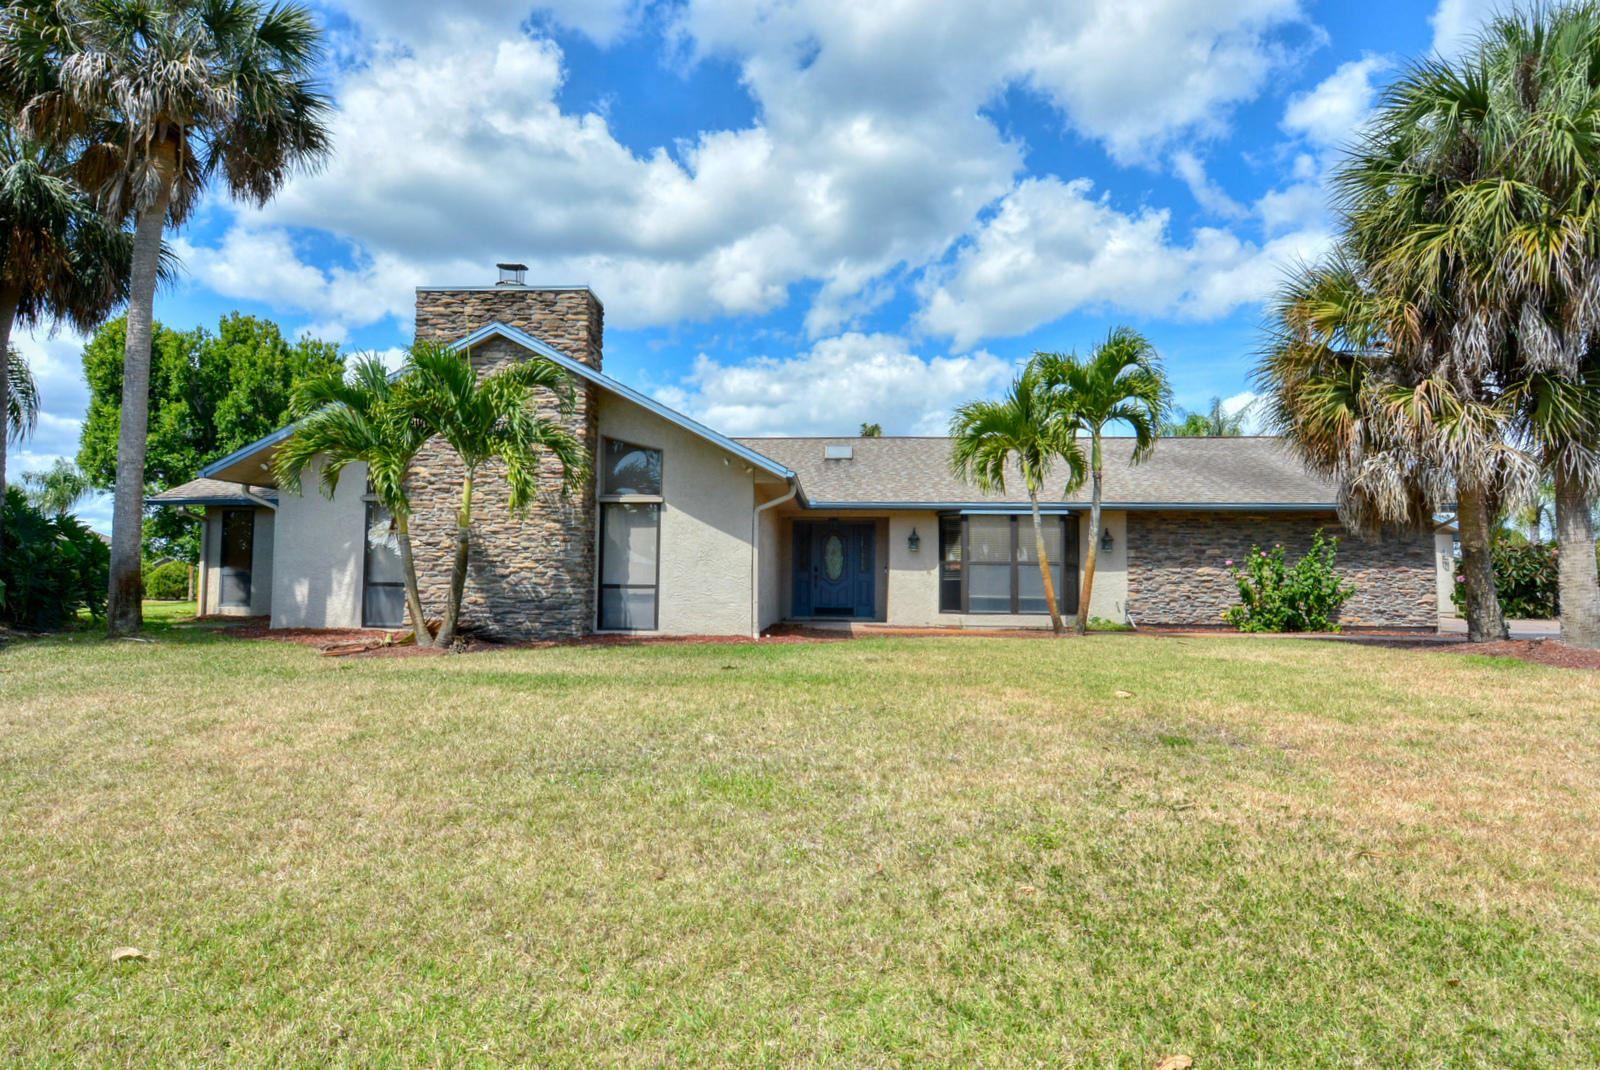 2486 SE Elston Street, Port Saint Lucie, FL 34952 - #: RX-10706518